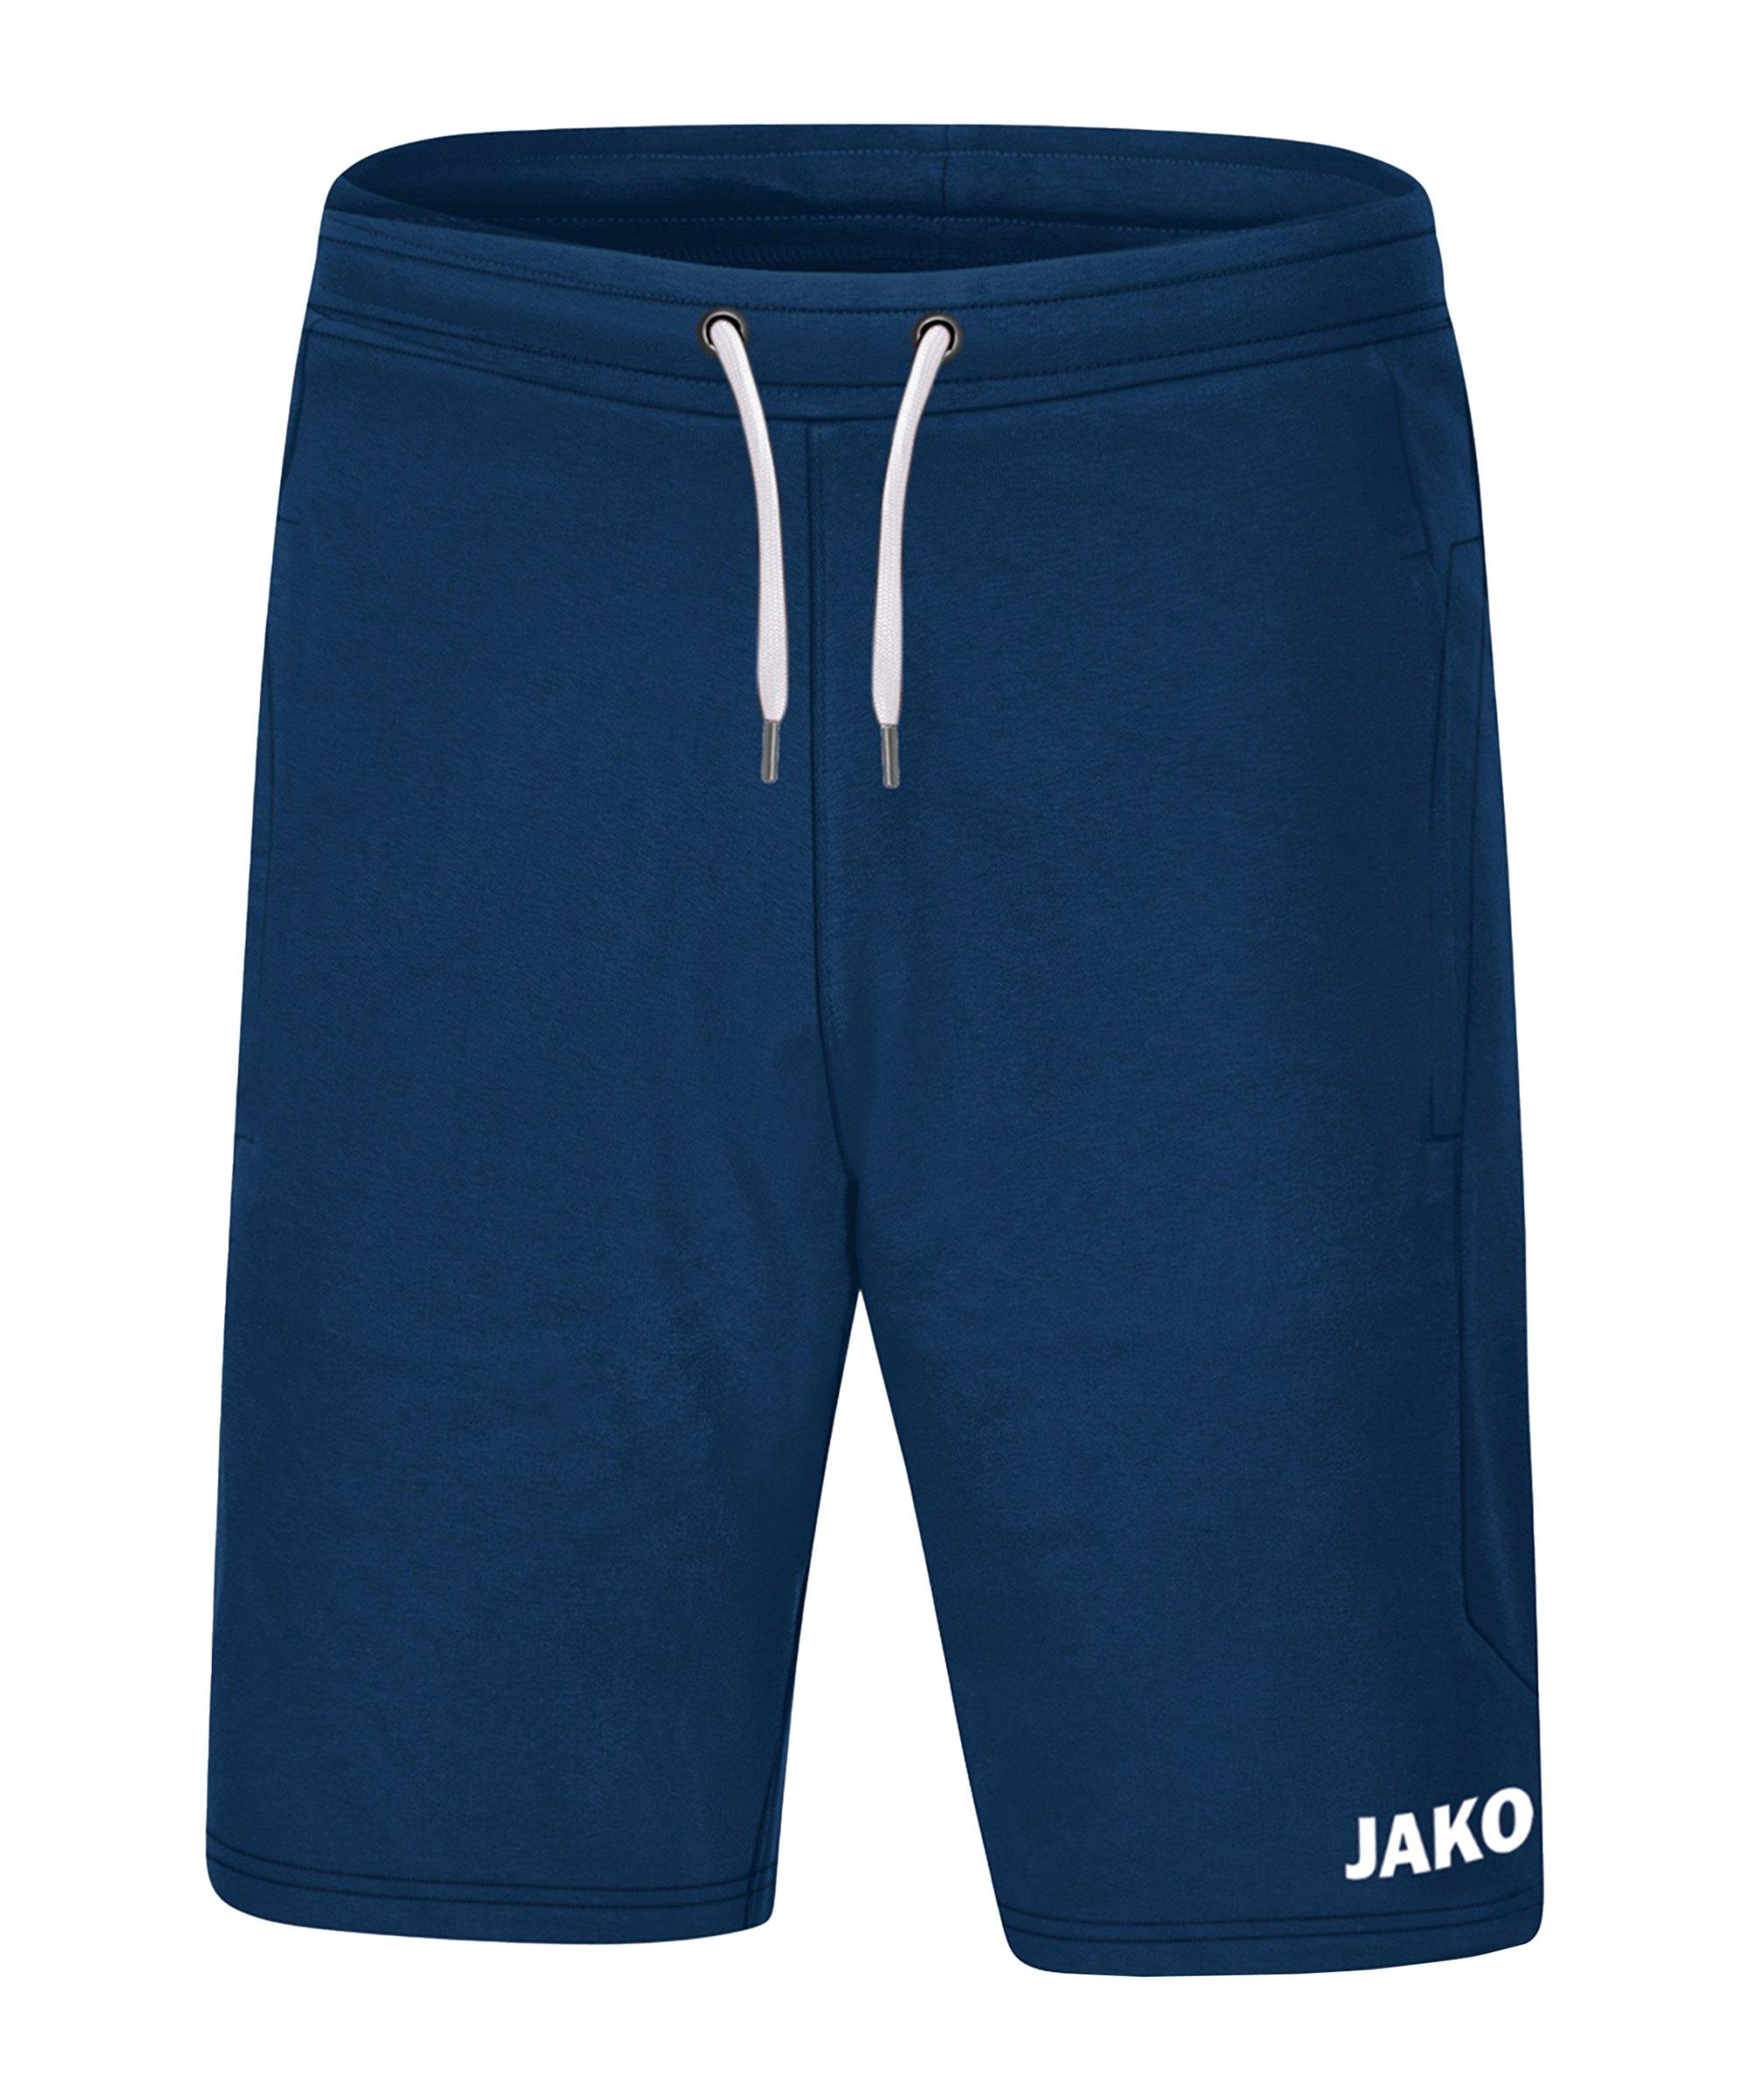 JAKO Base Short Blau F09 - blau